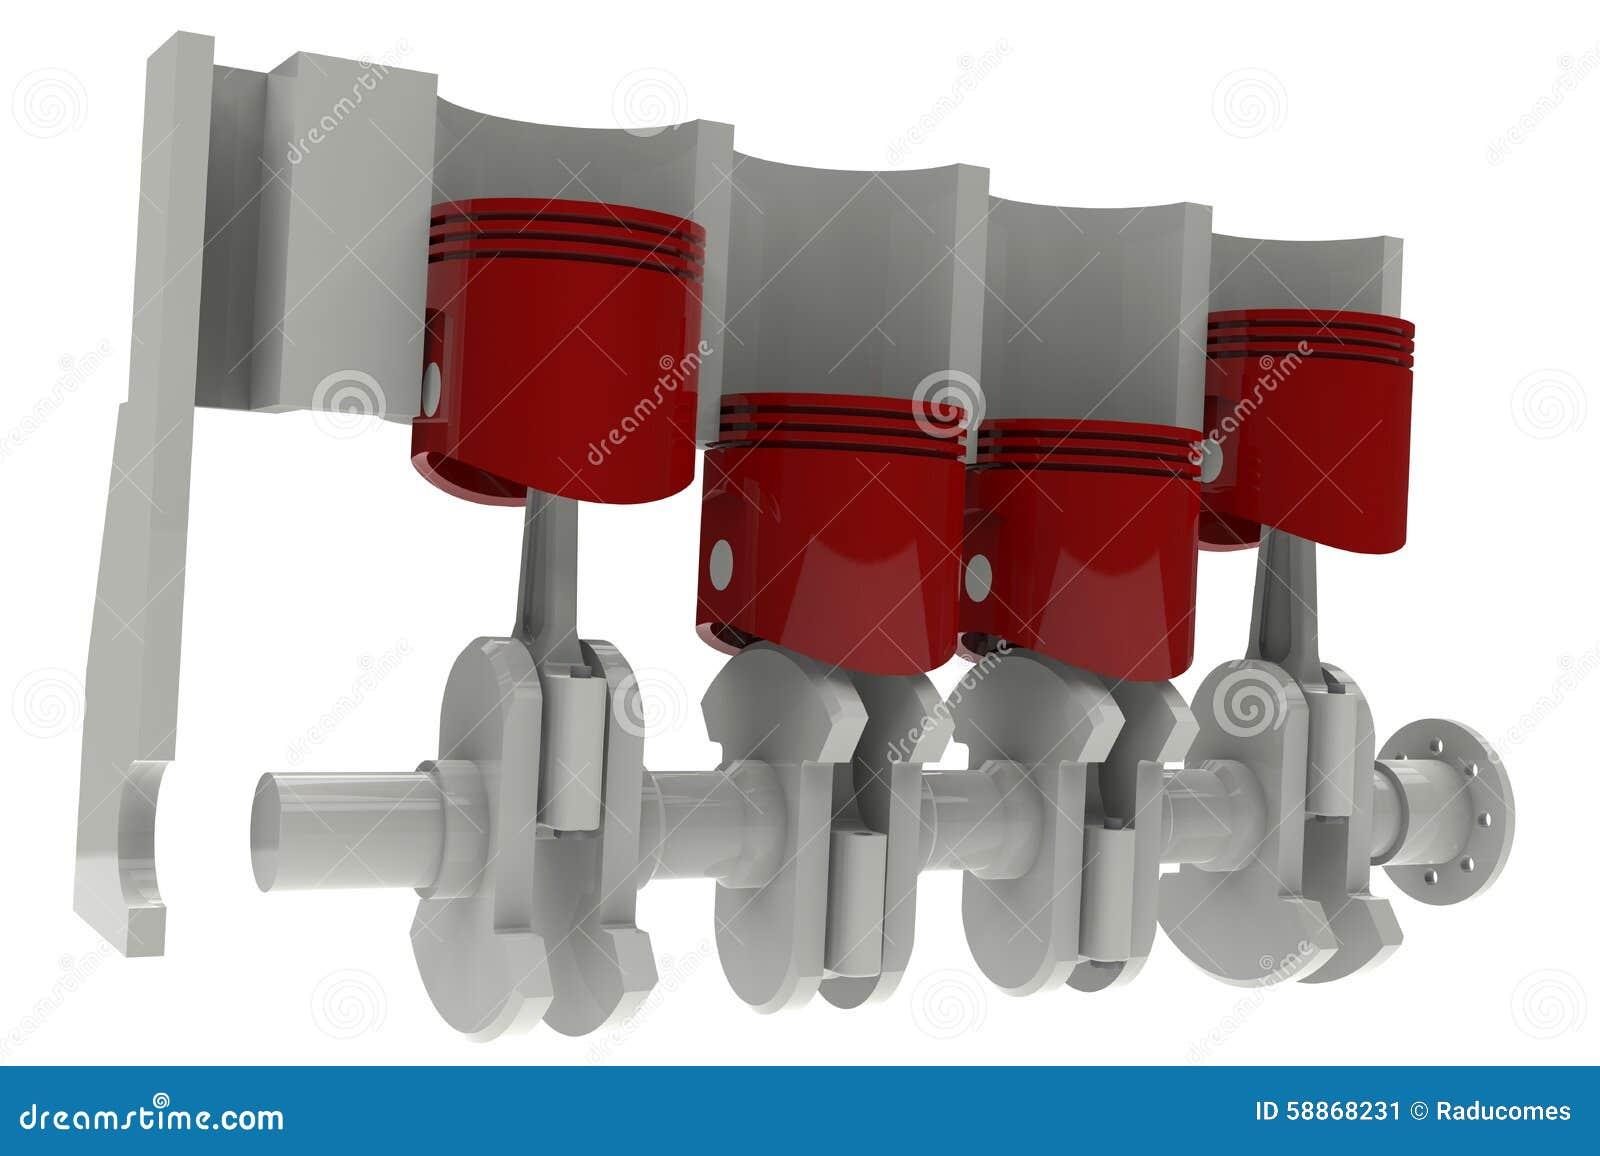 Red Pistons And Grey Crankshaft Stock Illustration Of Engine Diagram Schedule